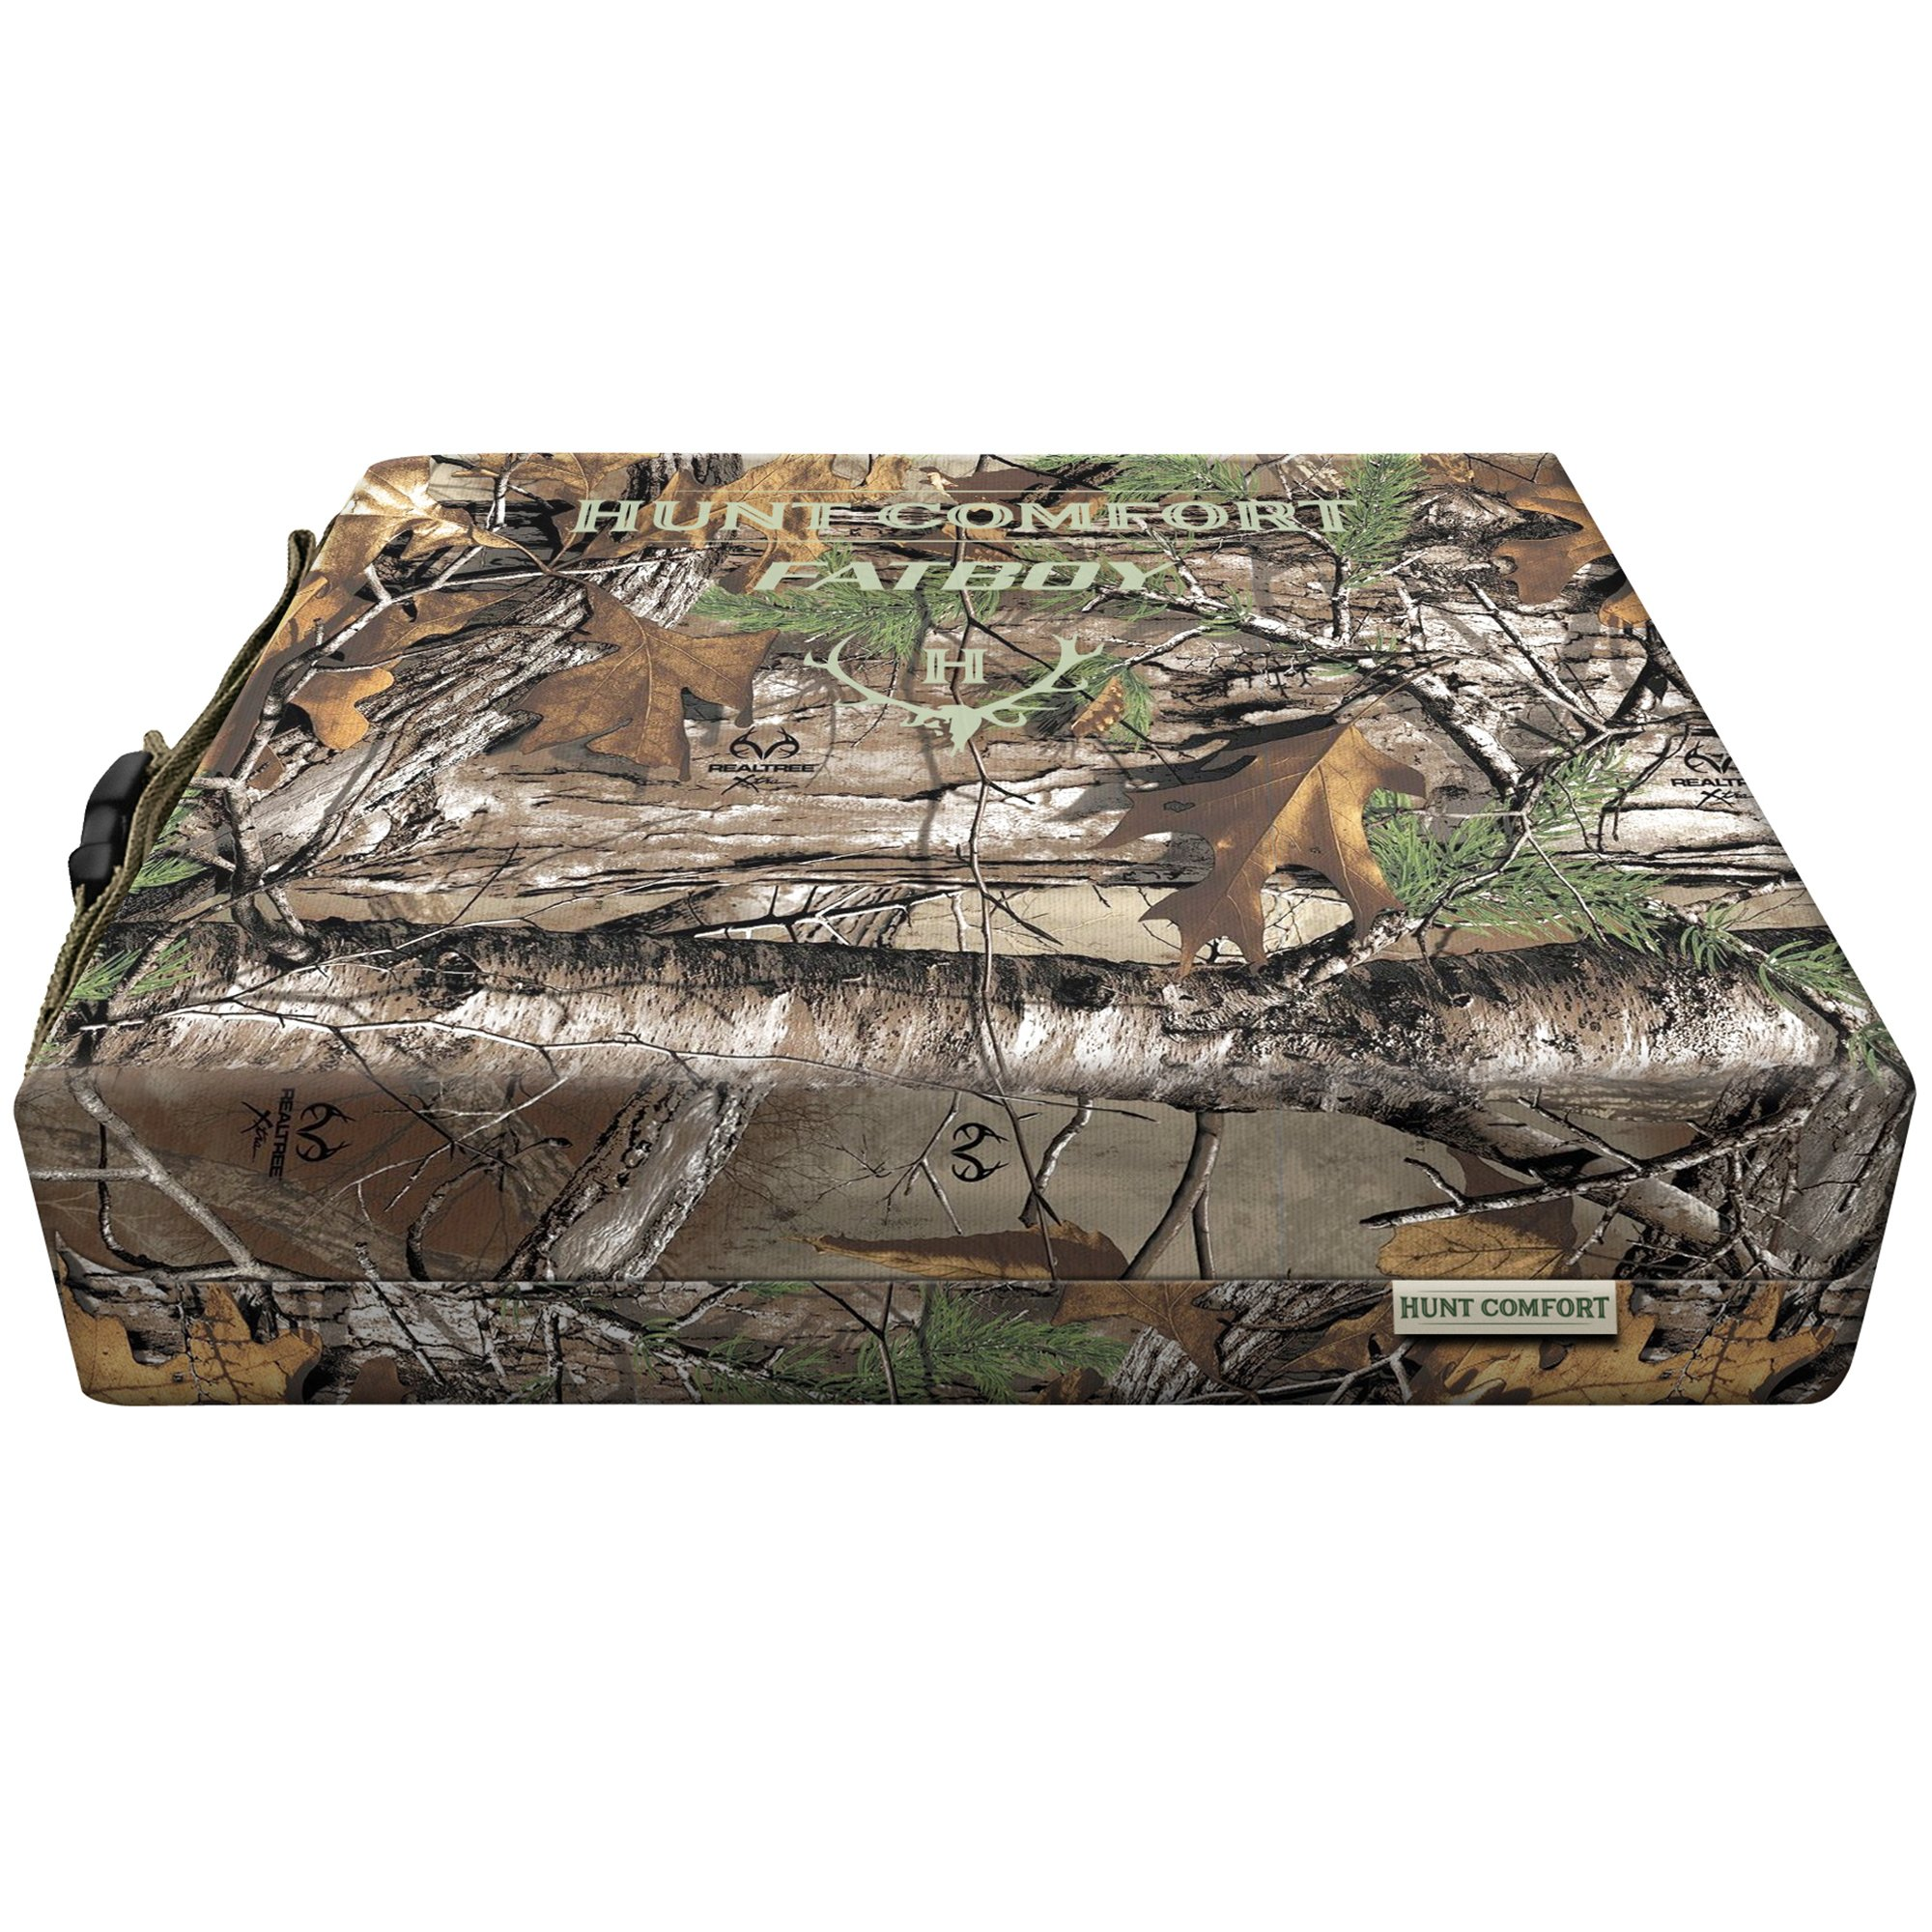 Hunt Comfort HCSC75G Ultra-Premium Gel Core Fatboy Cushion Realtreex